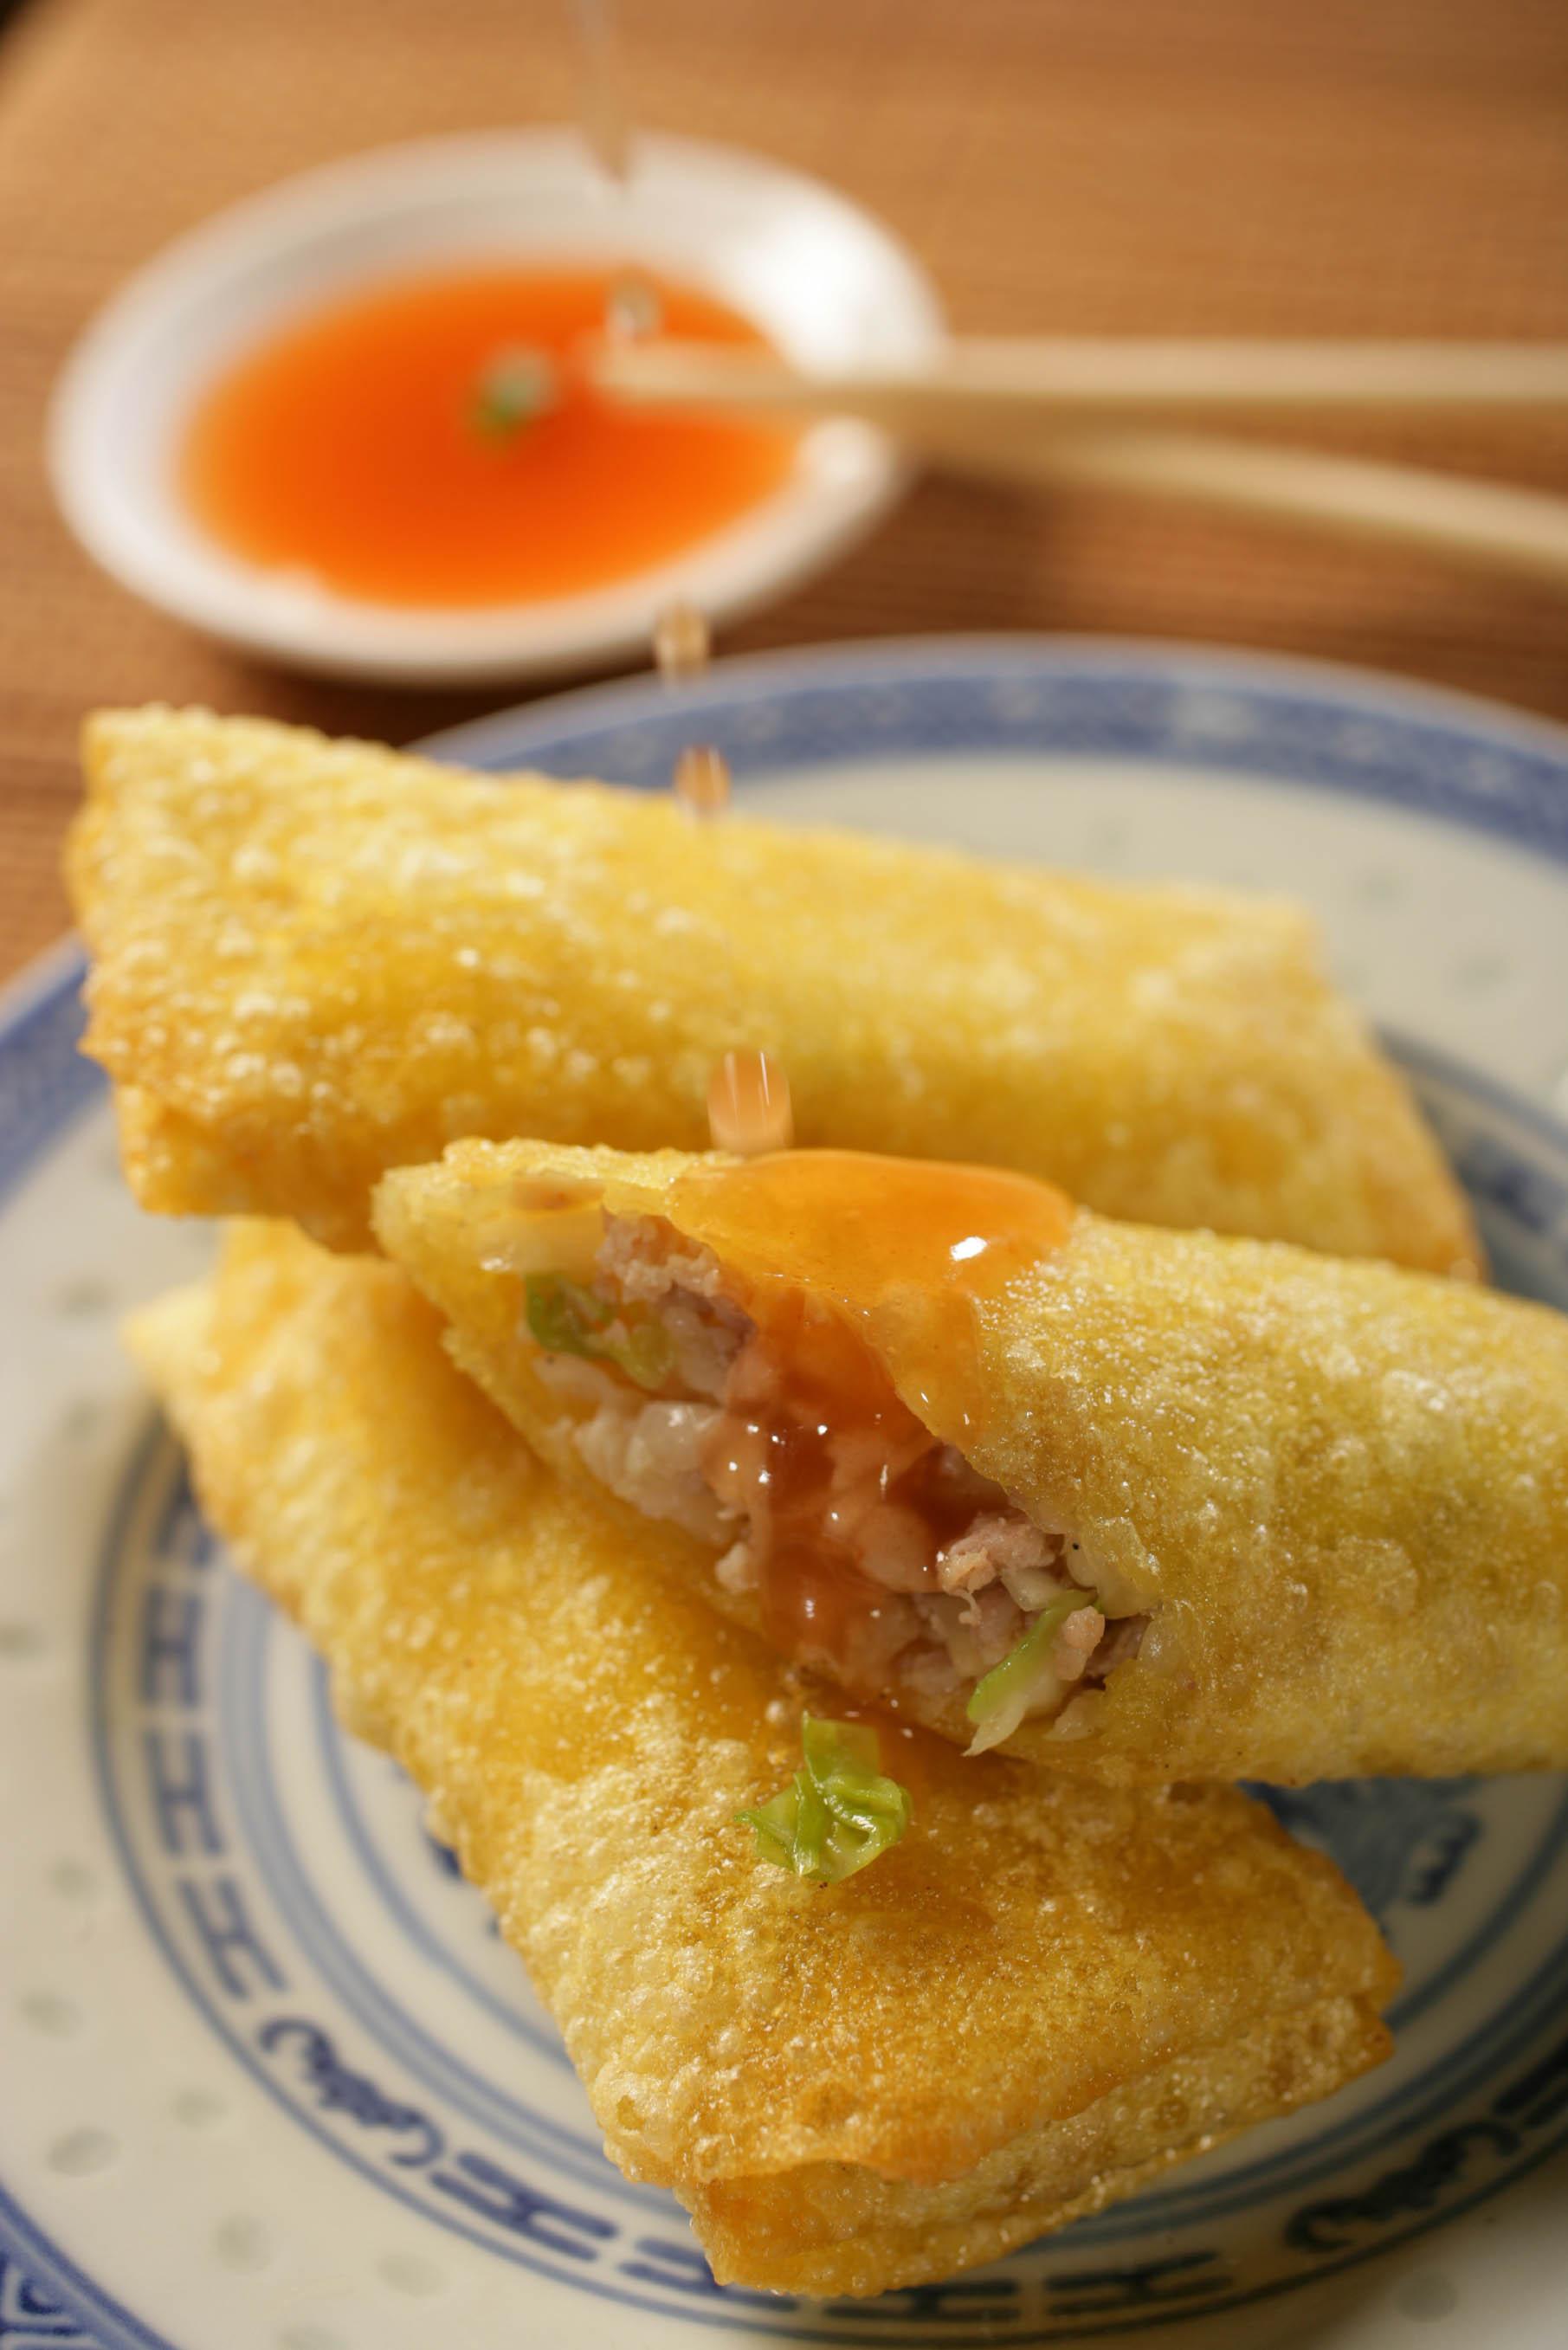 Cooking as a bridge between cultures